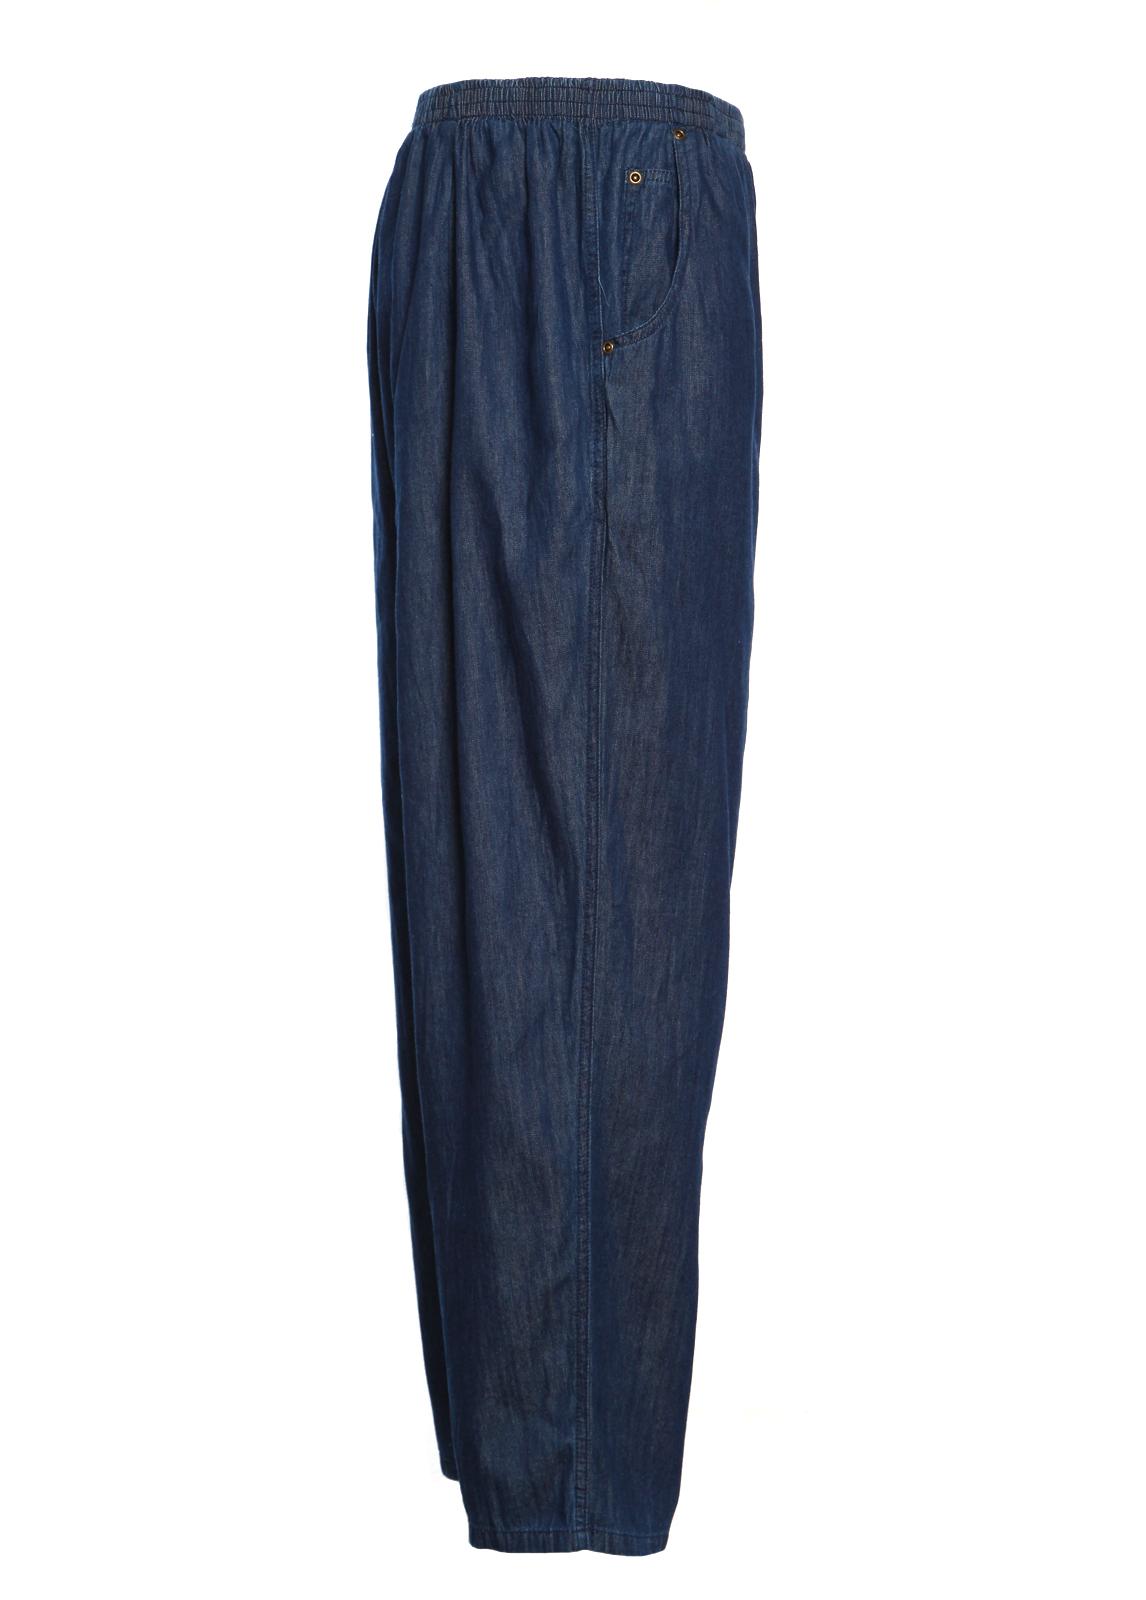 Beautiful Koret Womens Elastic Waist Casual Denim Casual Jeans Pull On Pants